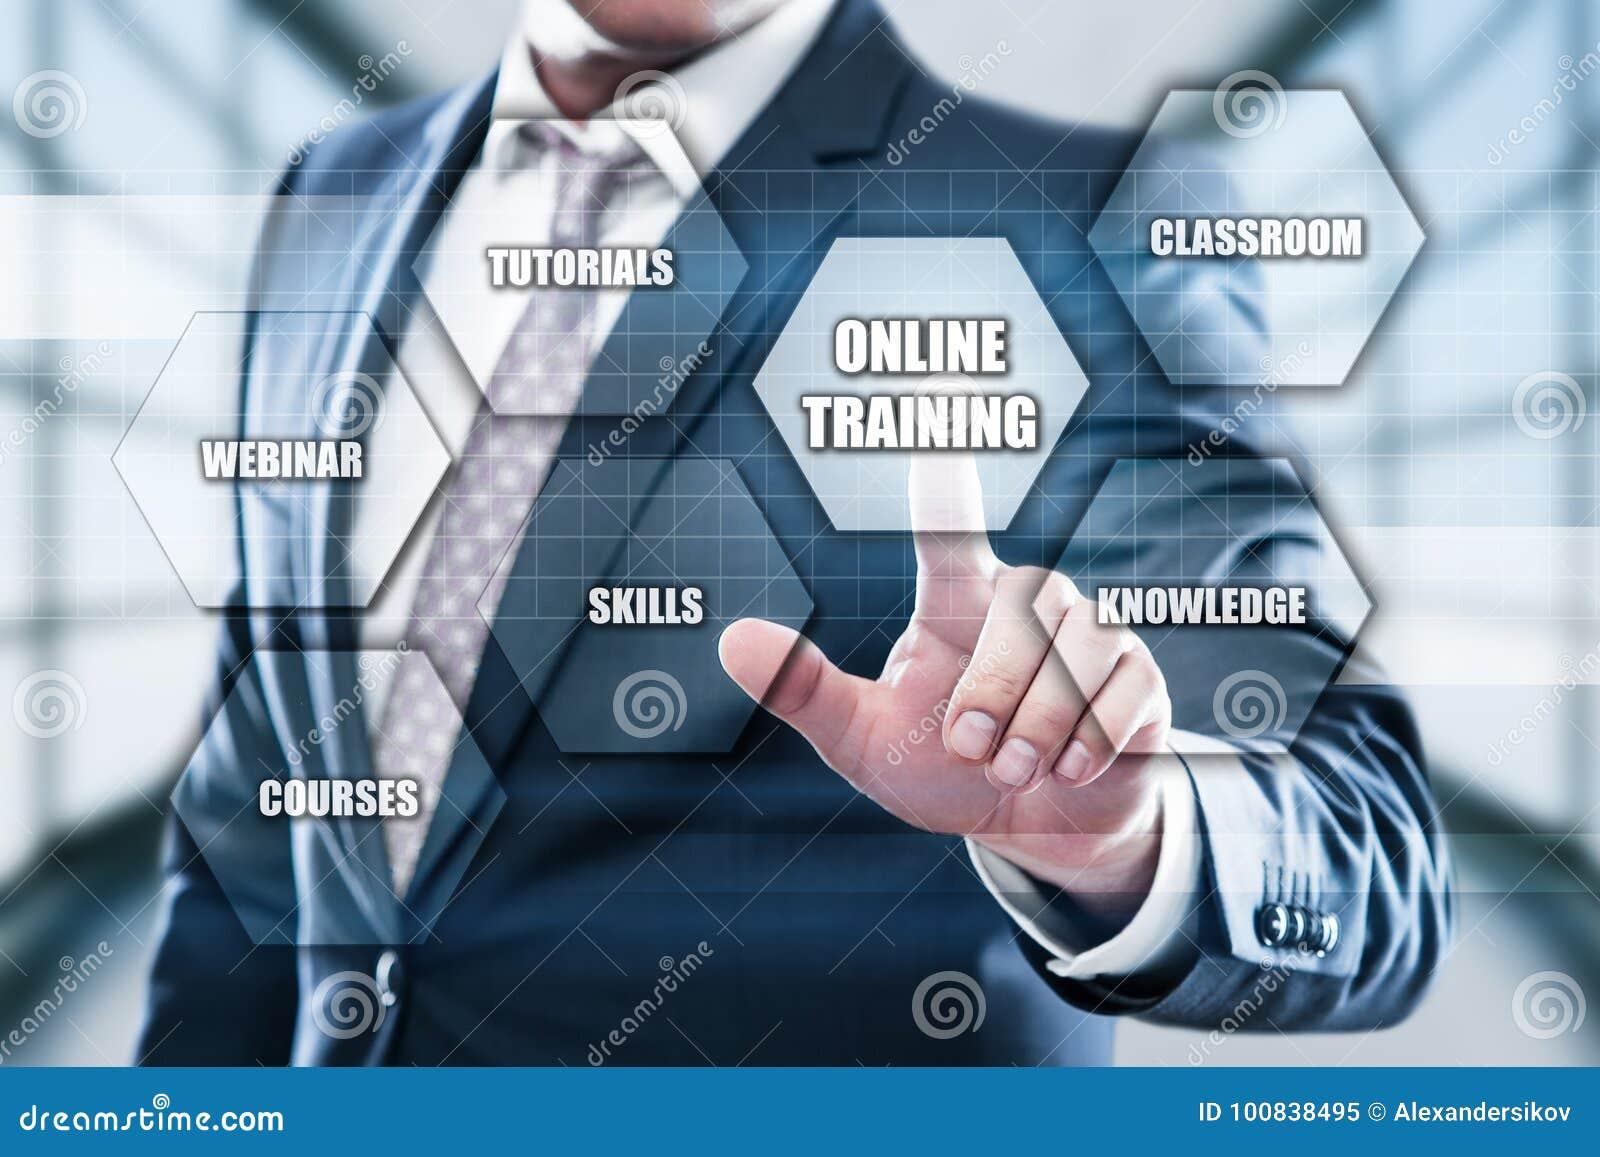 Online Training Webinar E-learning Skills Business Internet Technology Concept